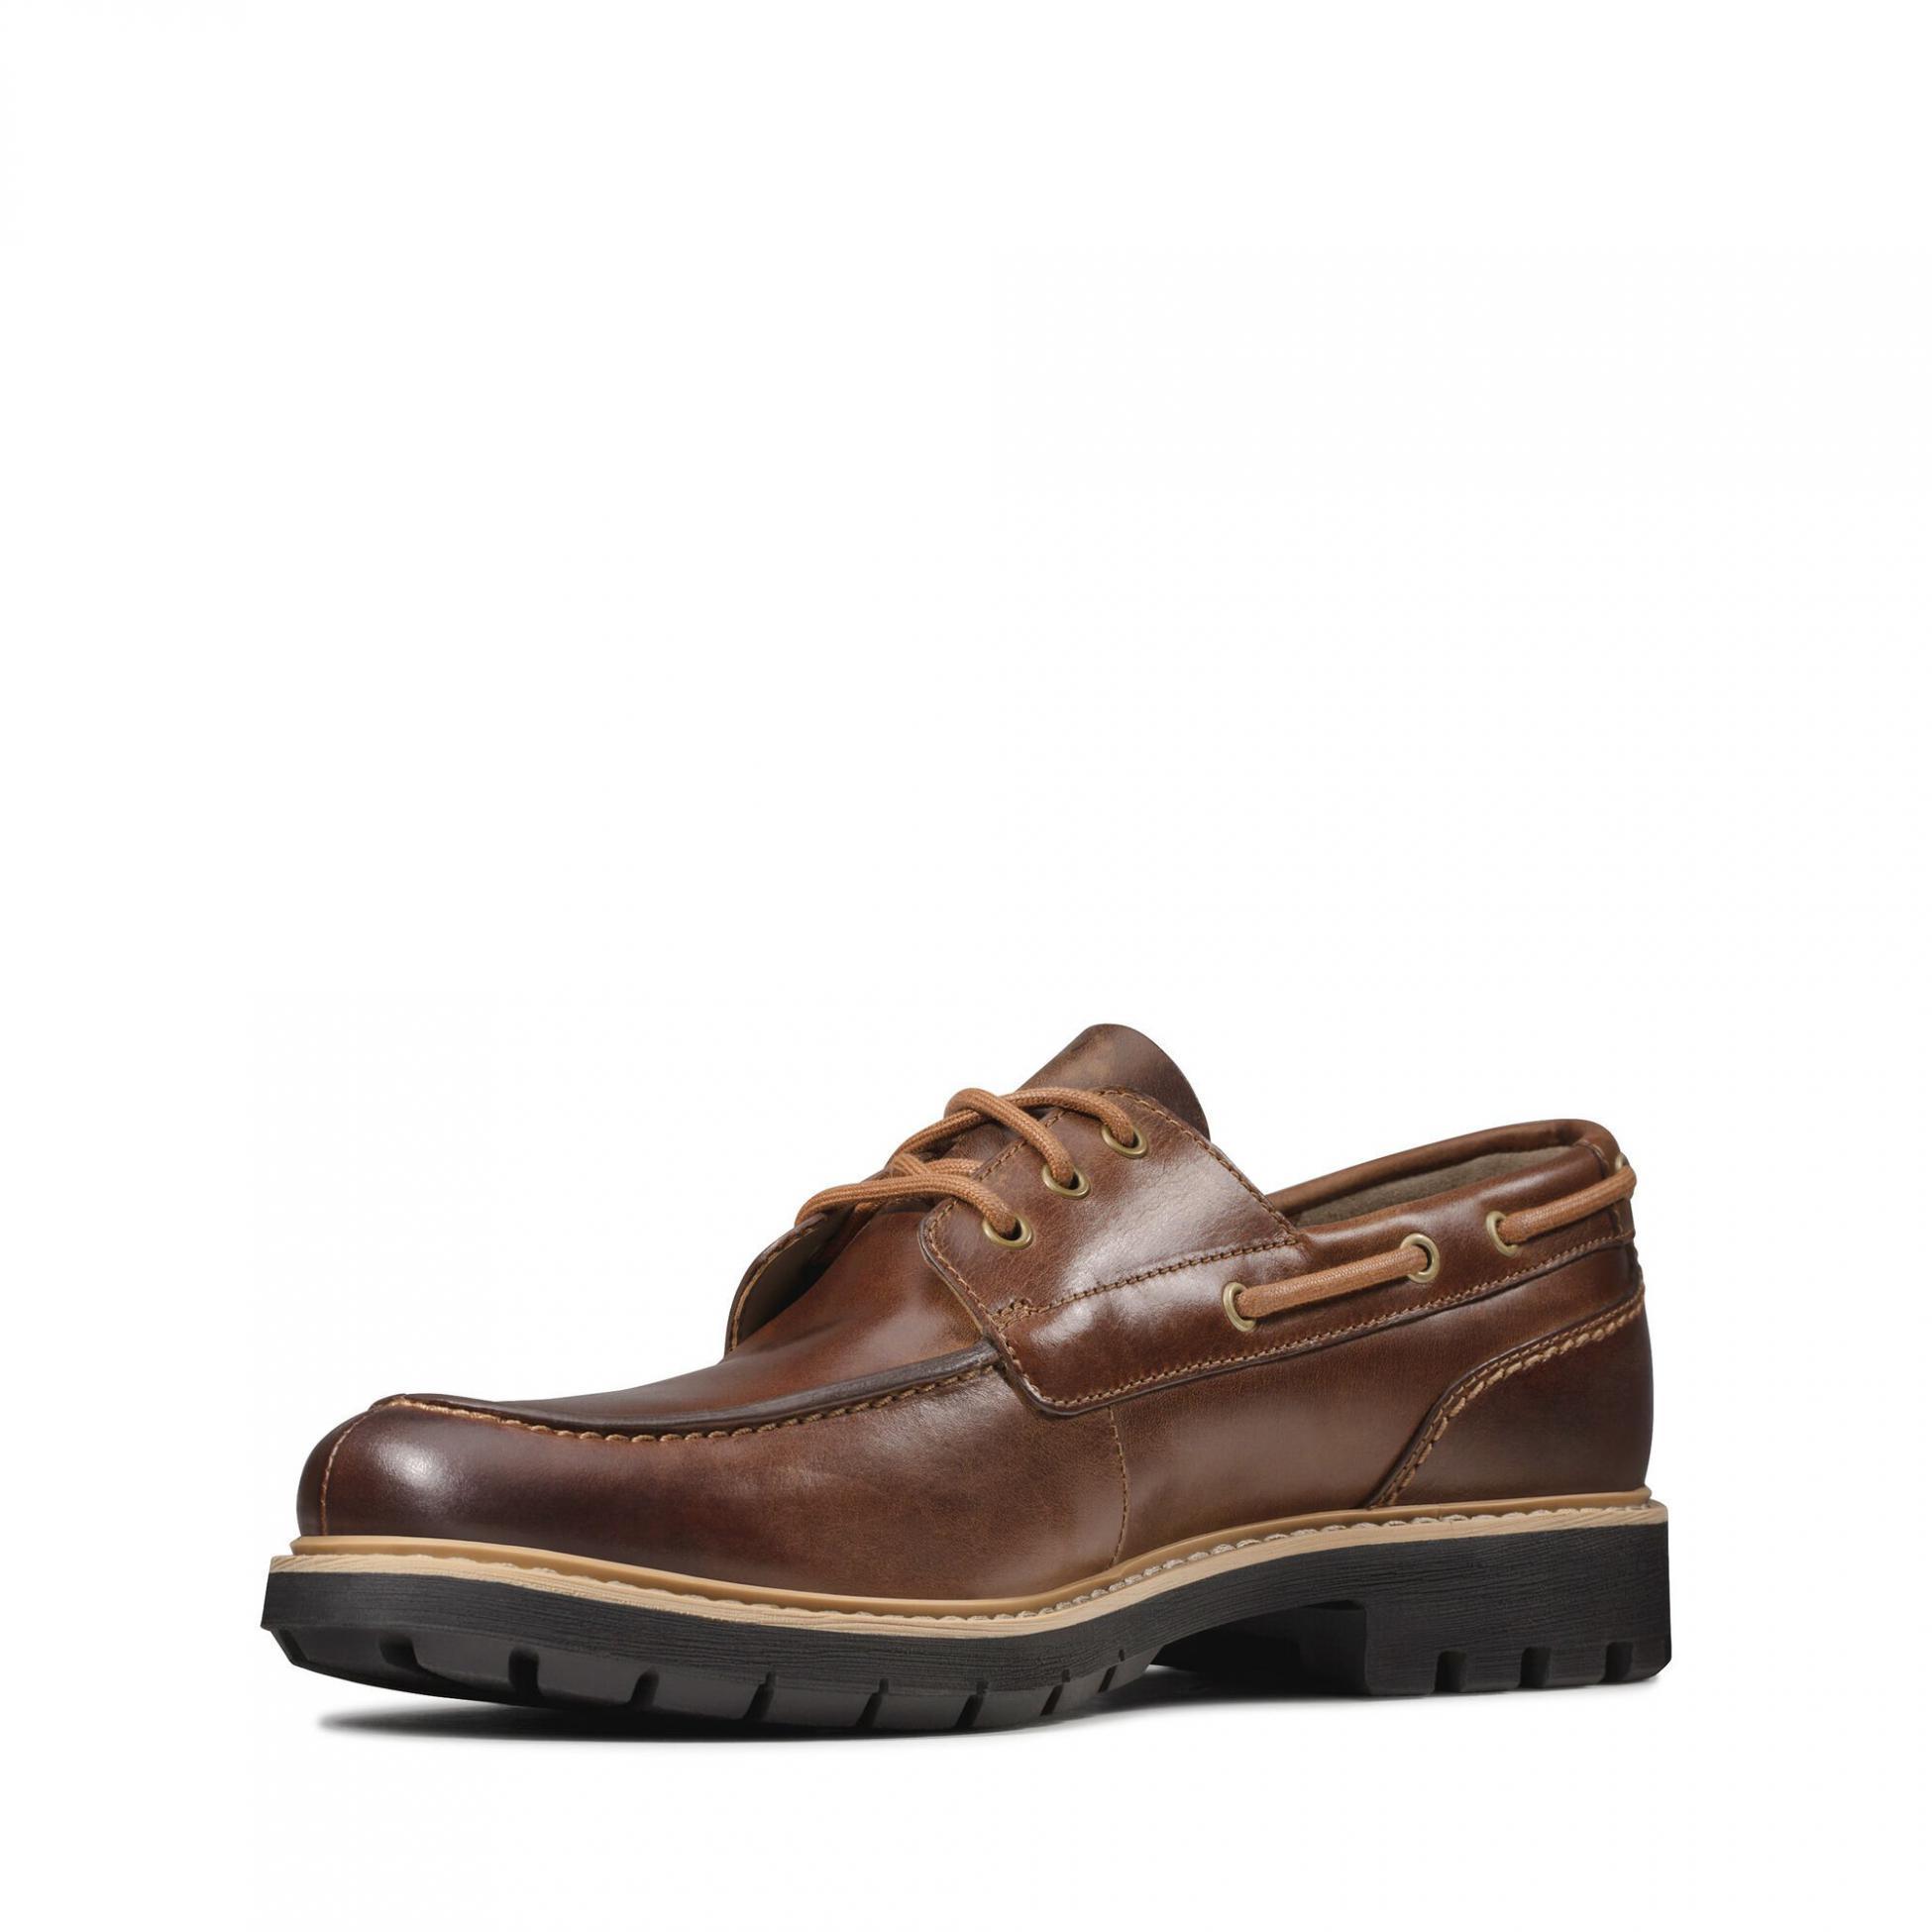 Clarks Men's Batcombe Sail Shoes Various Colours 5050410169427 - 8 UK Dark Tan